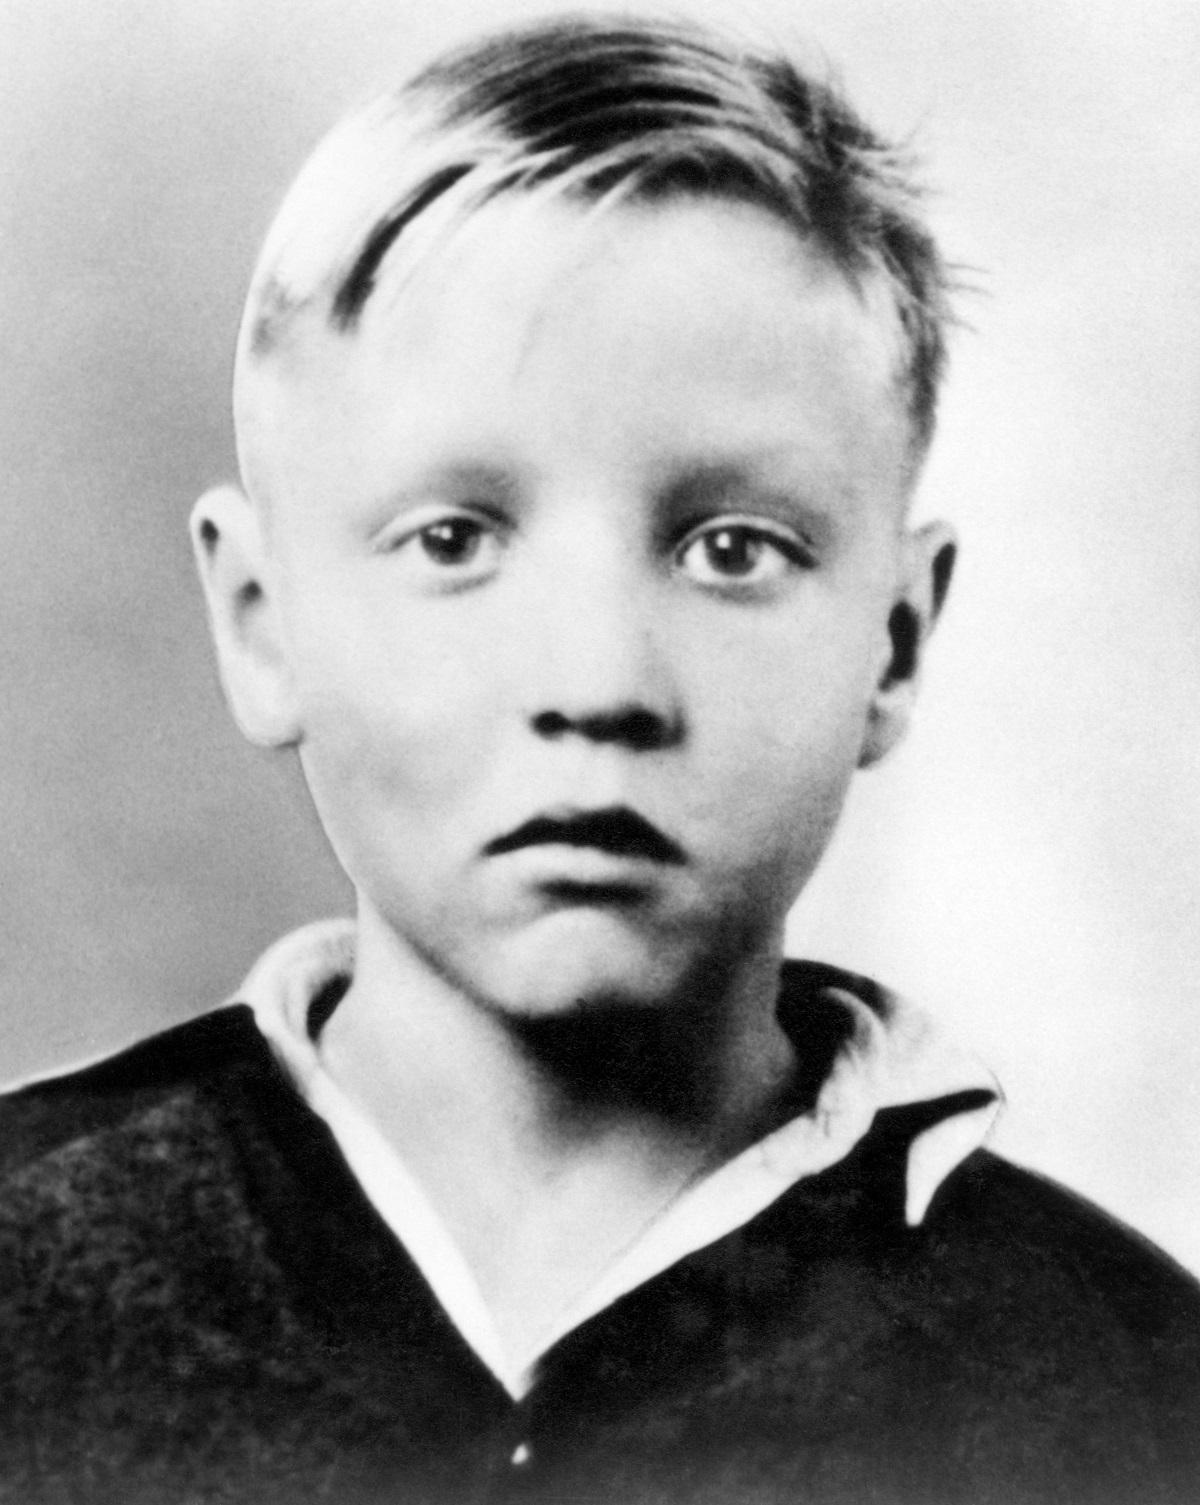 Elvis Presley as a child